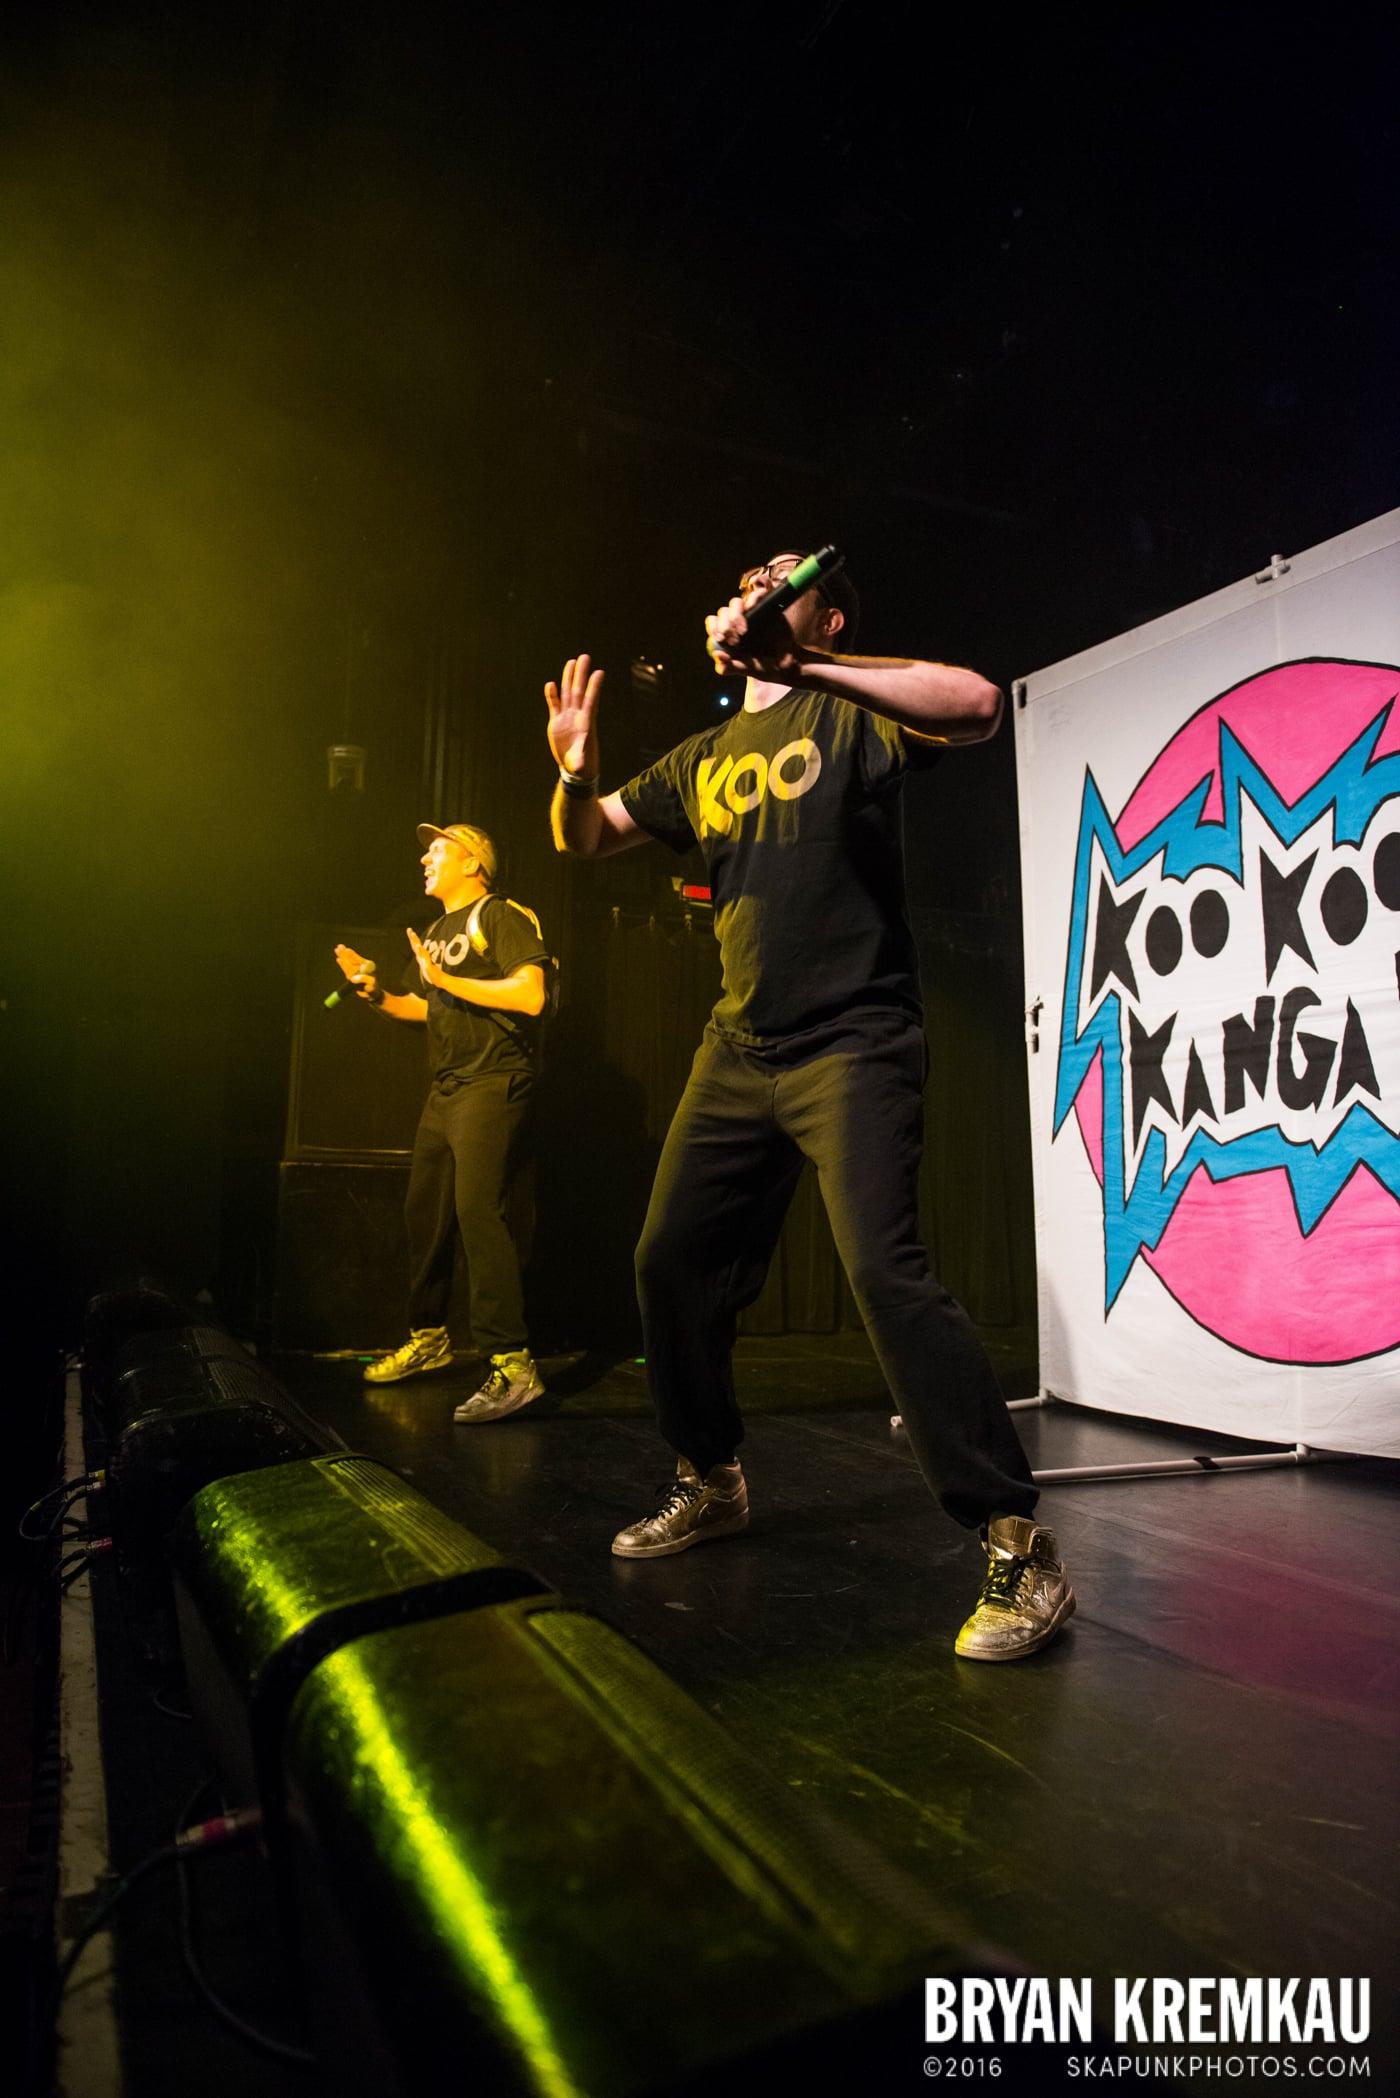 Koo Koo Kanga Roo @ Irving Plaza, NYC - 5.7.14 (23)